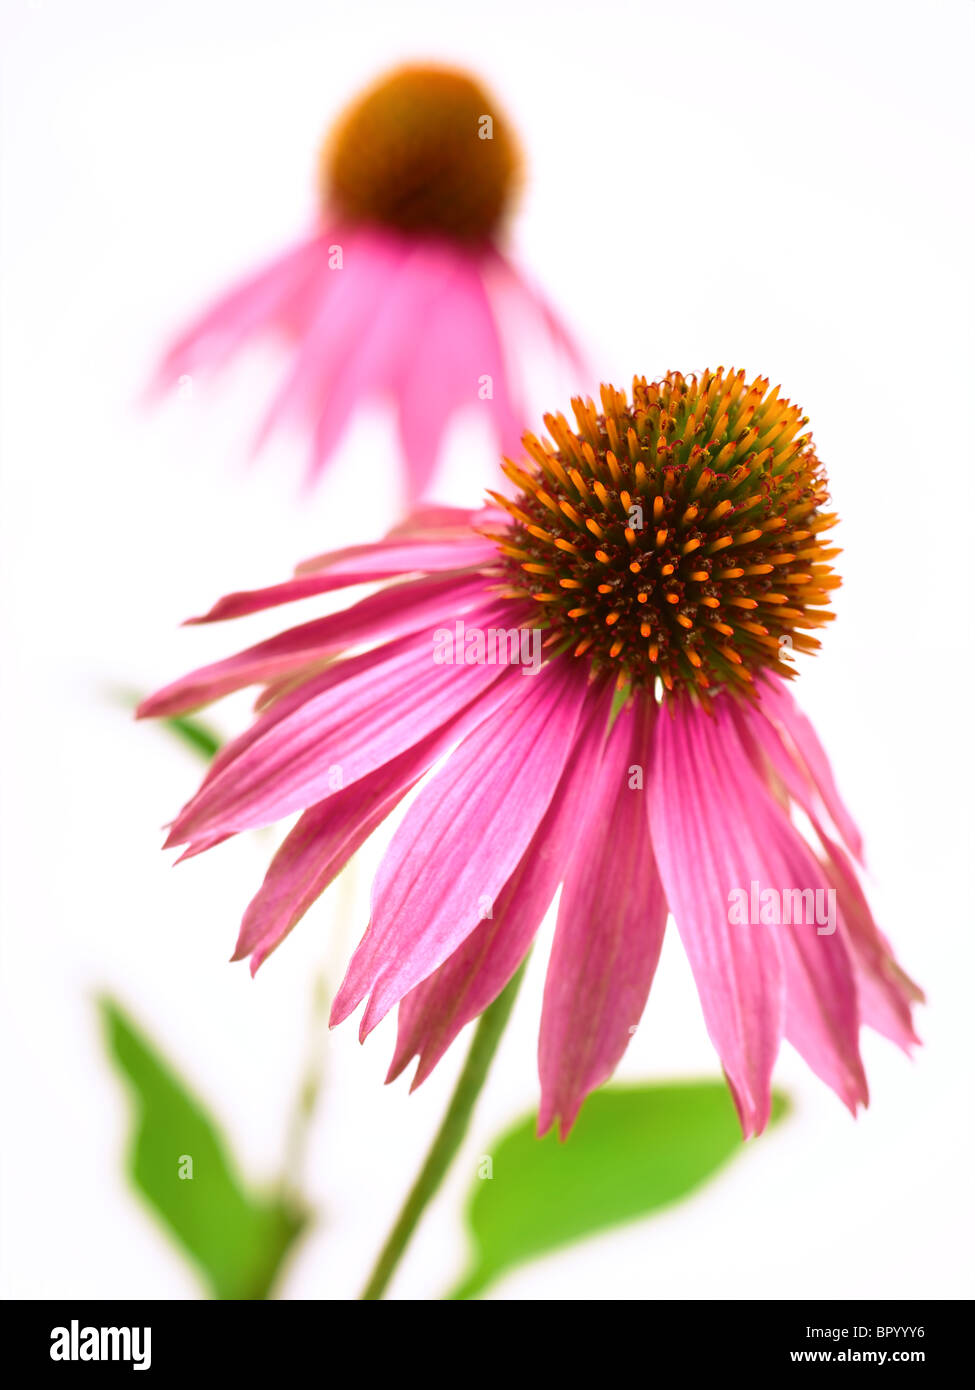 Echinacea - Stock Image